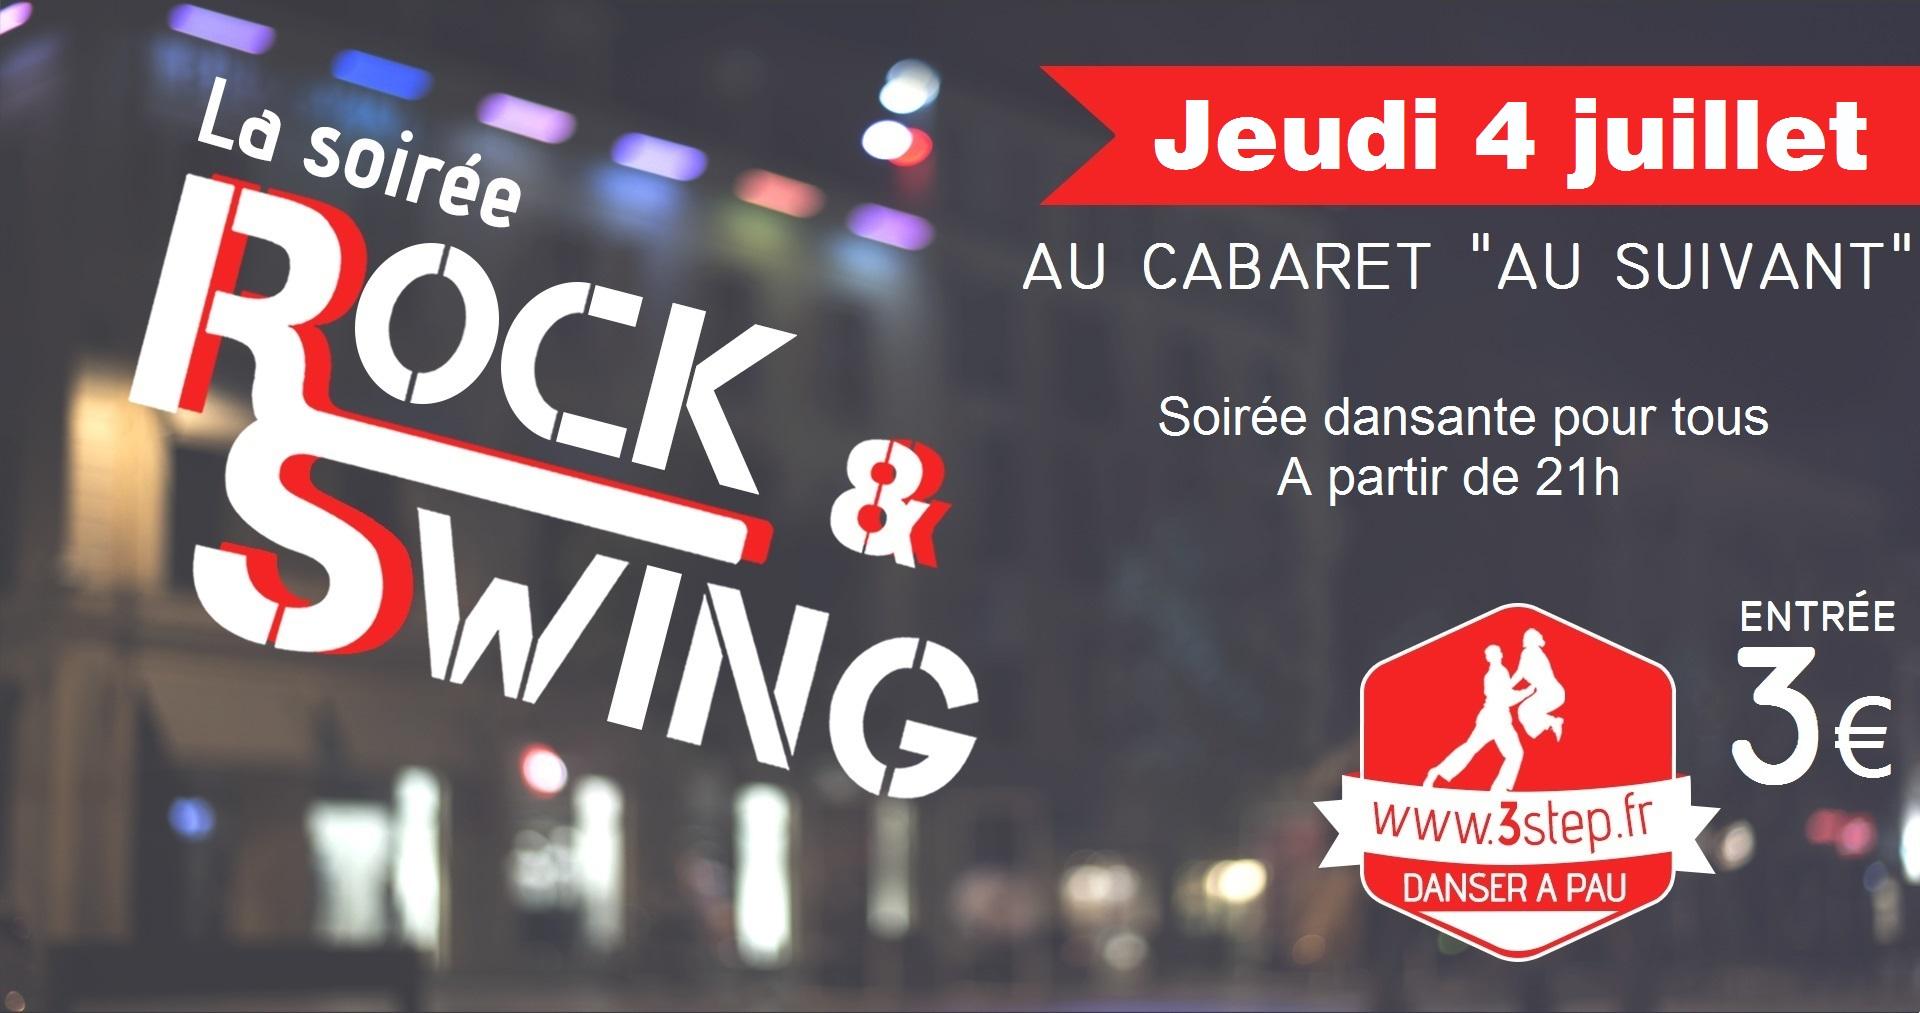 3step - soirée dansante rock swing au Cabaret Au Suivant - jeudi 4 juillet 2019